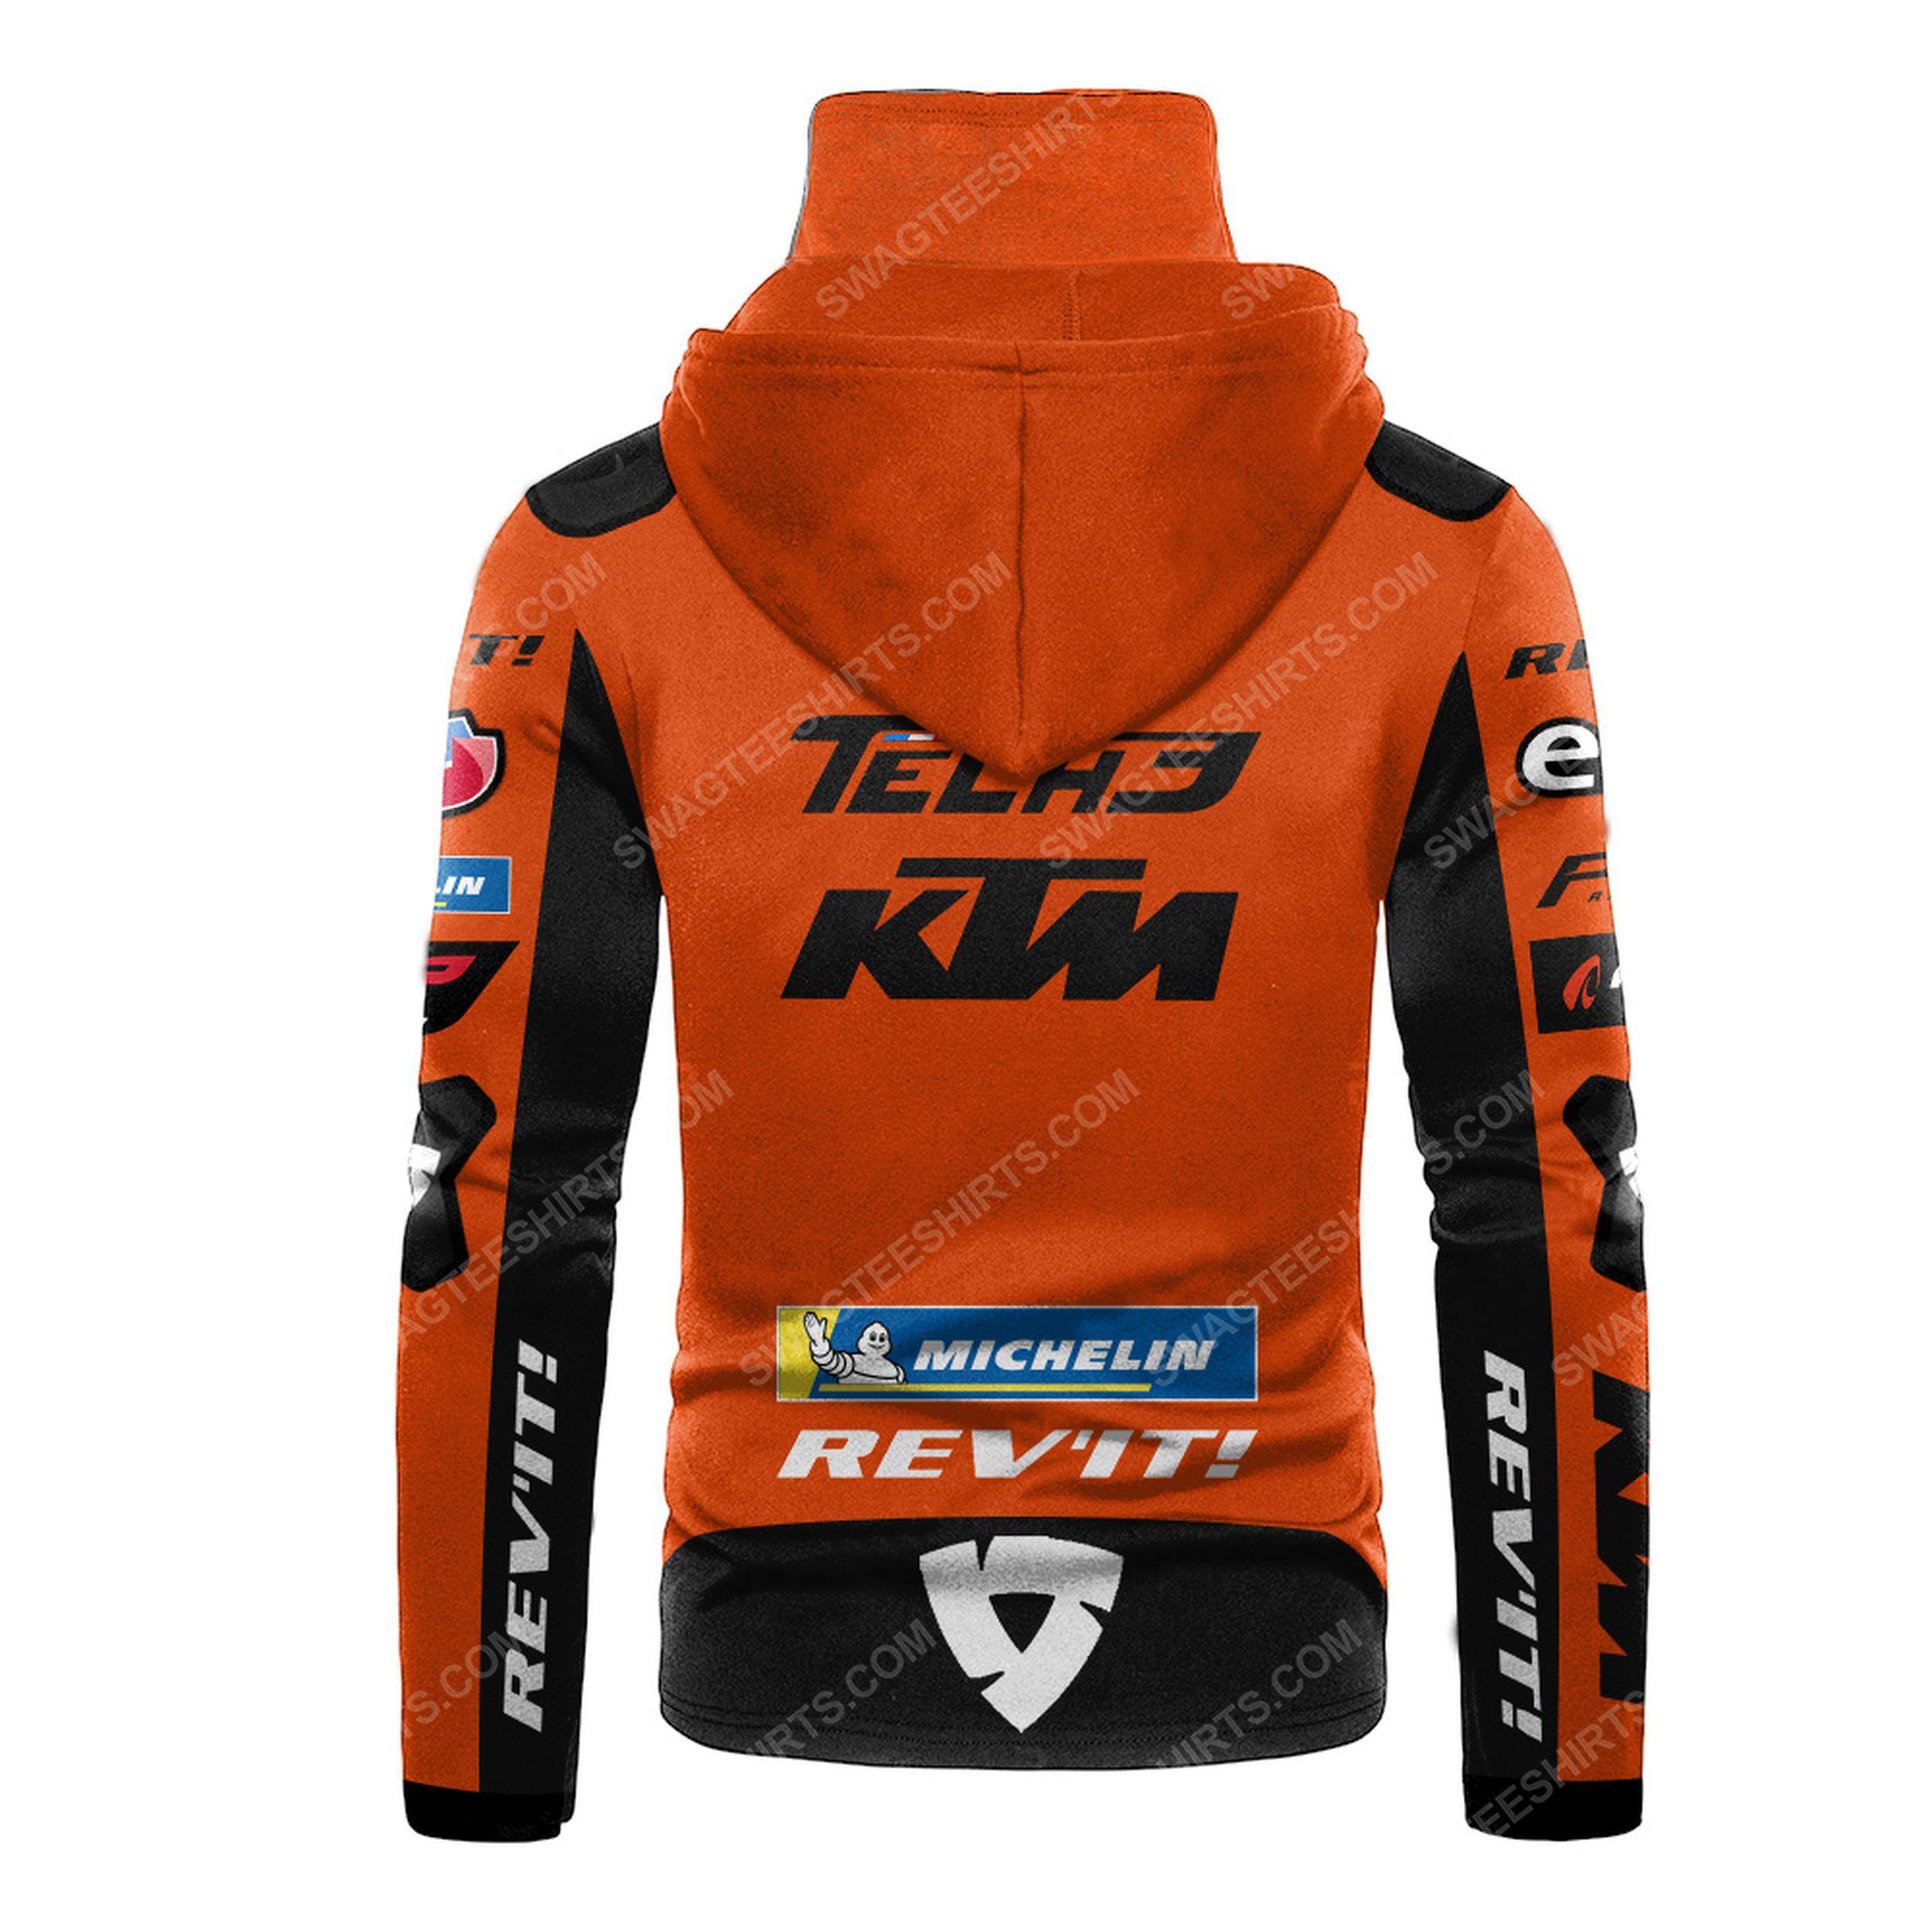 Custom name tech3 ktm factory racing full print mask hoodie 3(1)